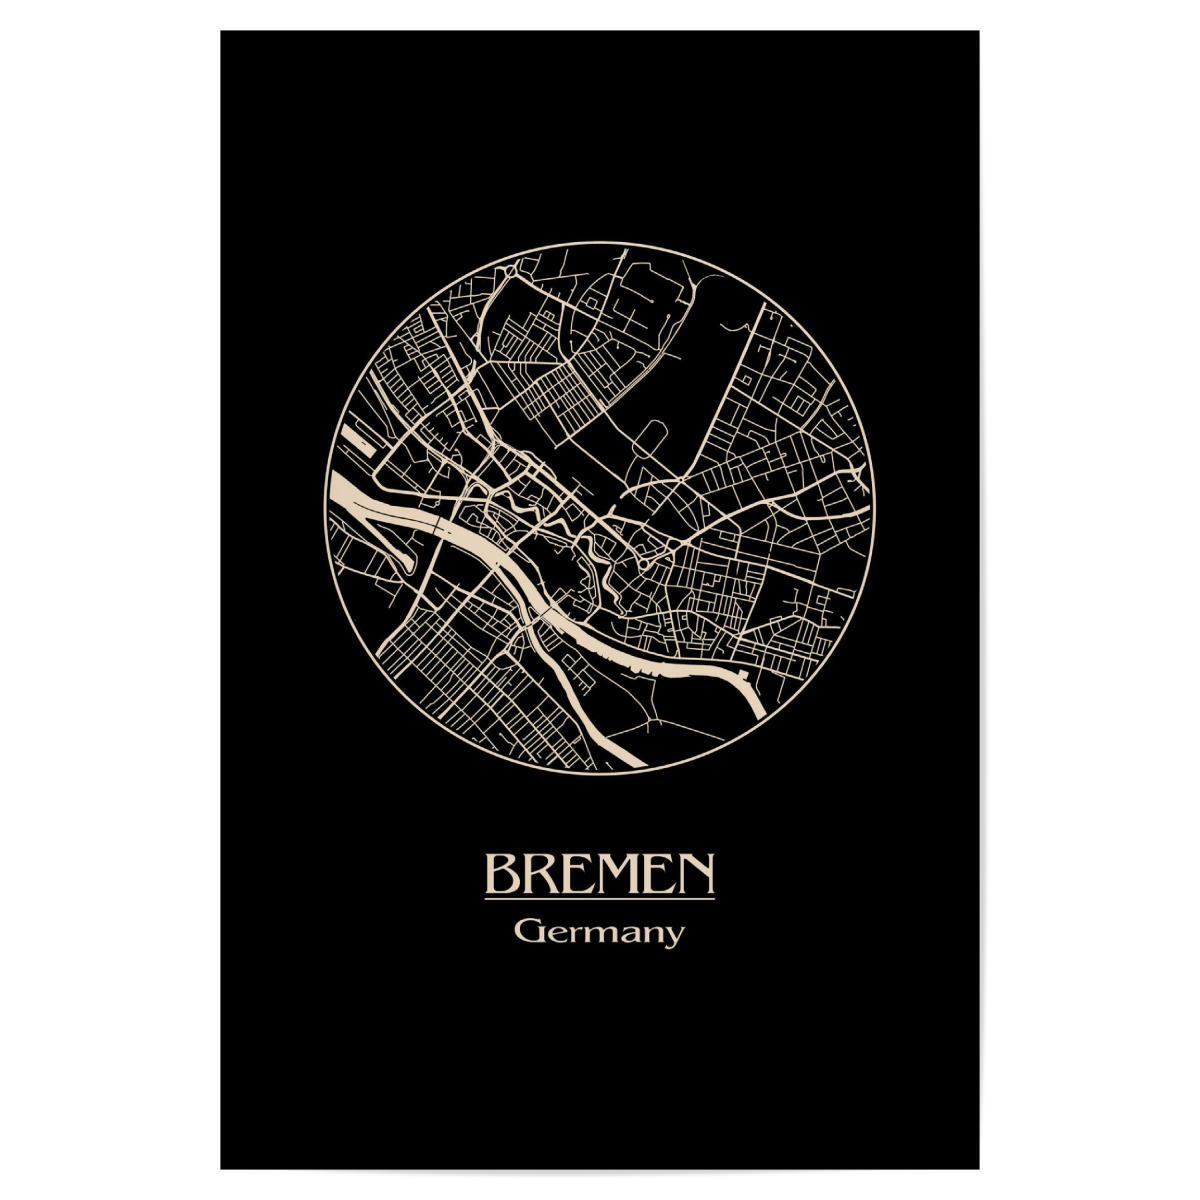 Bremen Germany Retro Map als Poster bei artboxONE kaufen